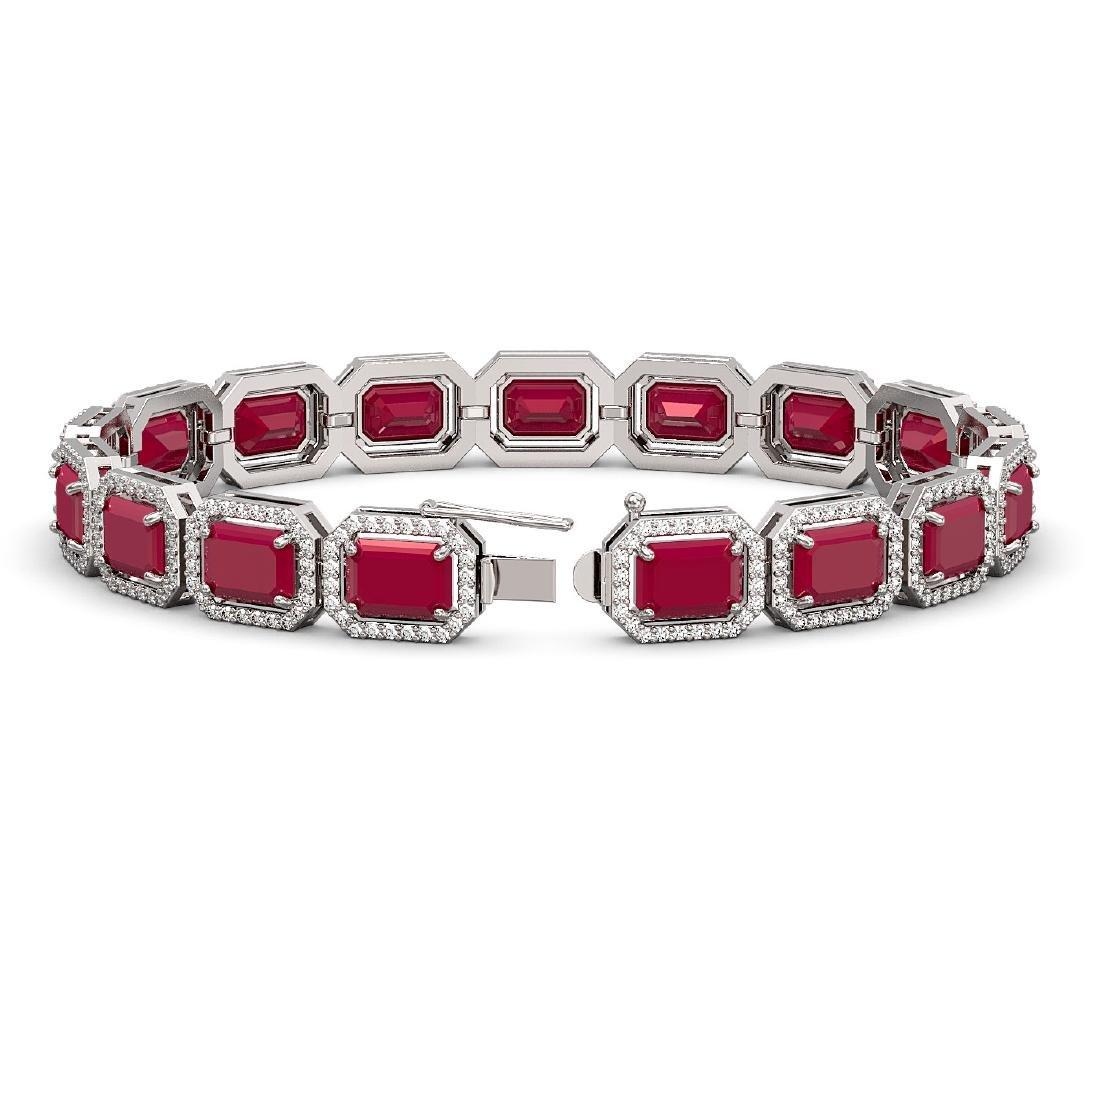 26.21 CTW Ruby & Diamond Halo Bracelet 10K White Gold - 2